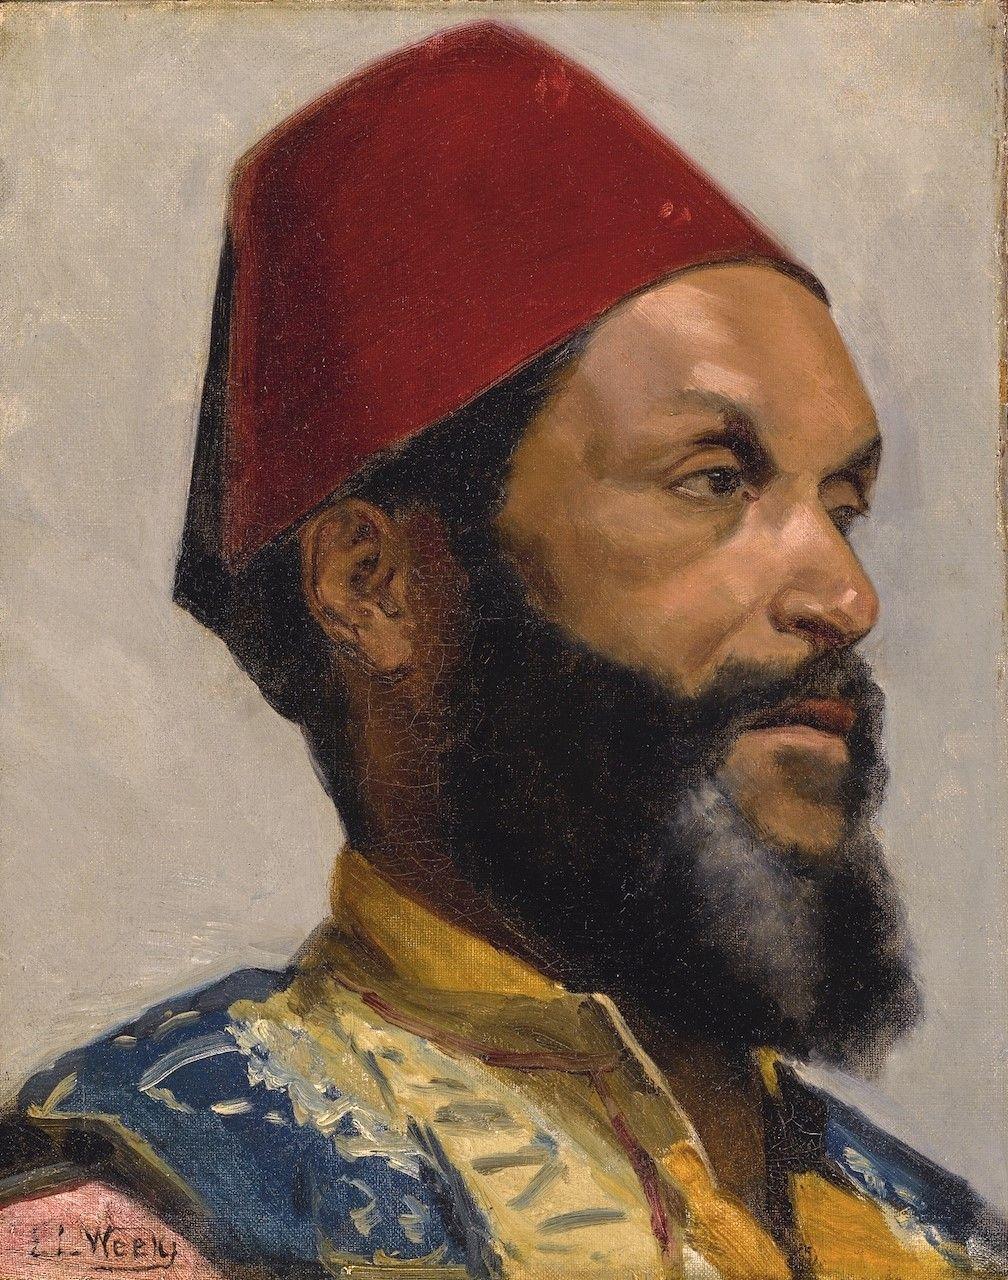 Portrait of a Turkish Man